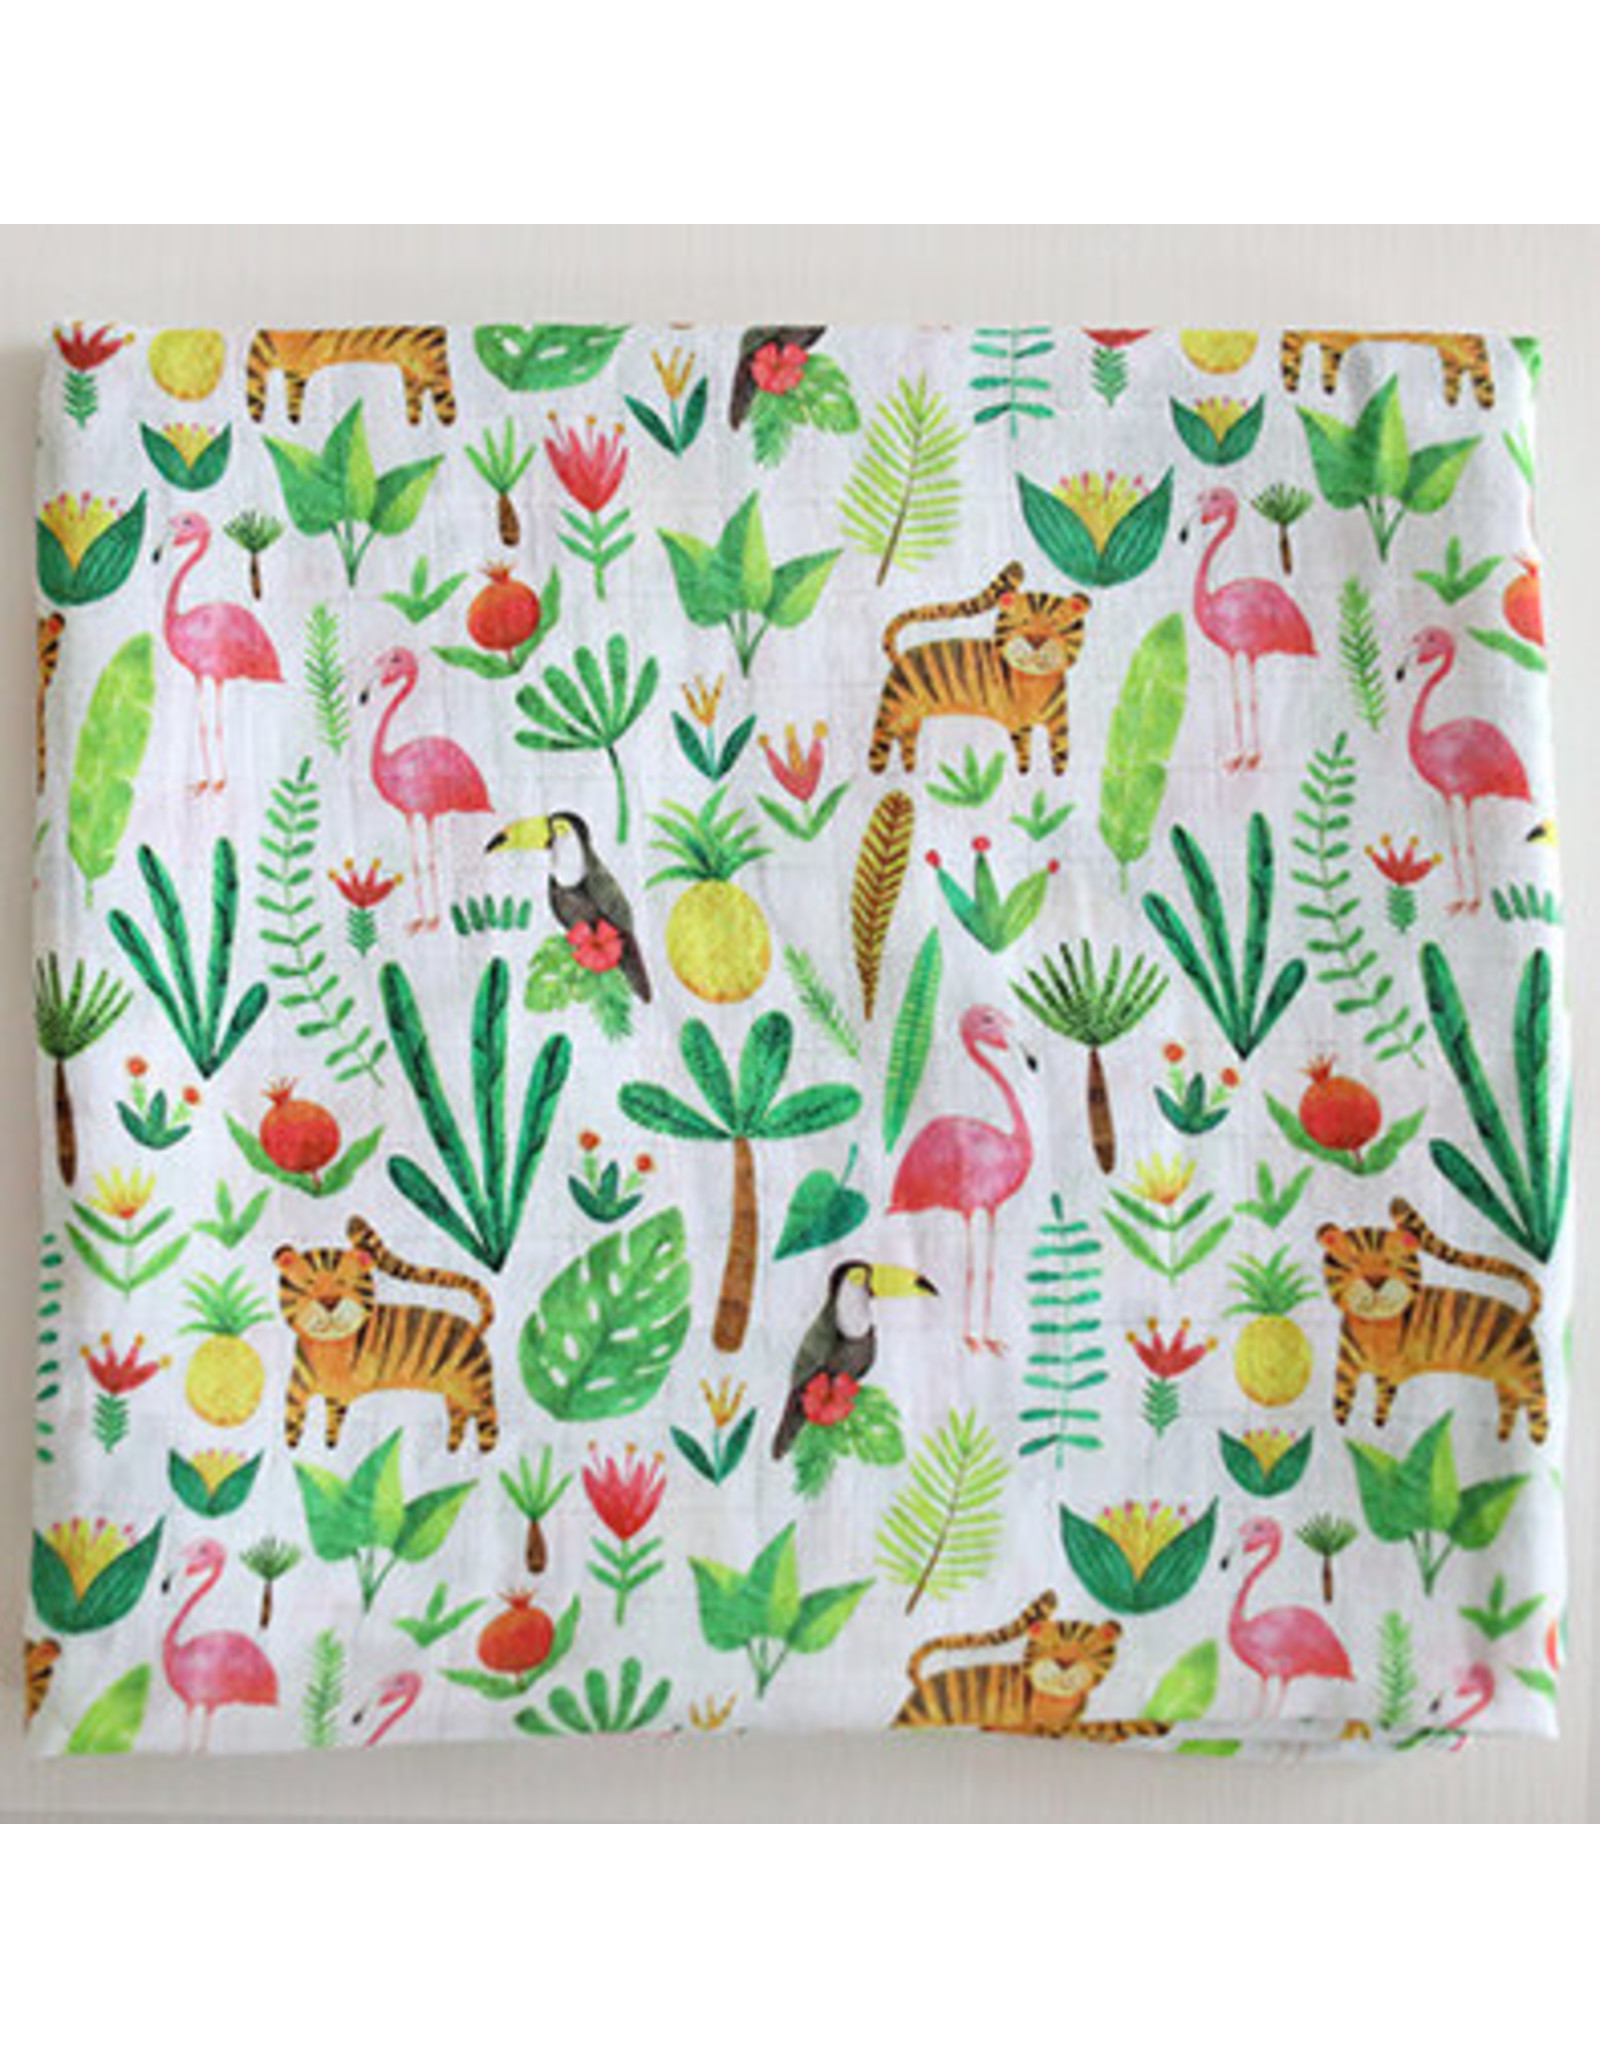 Fox in the Attic Muslin Swaddle Blanket -Tropical